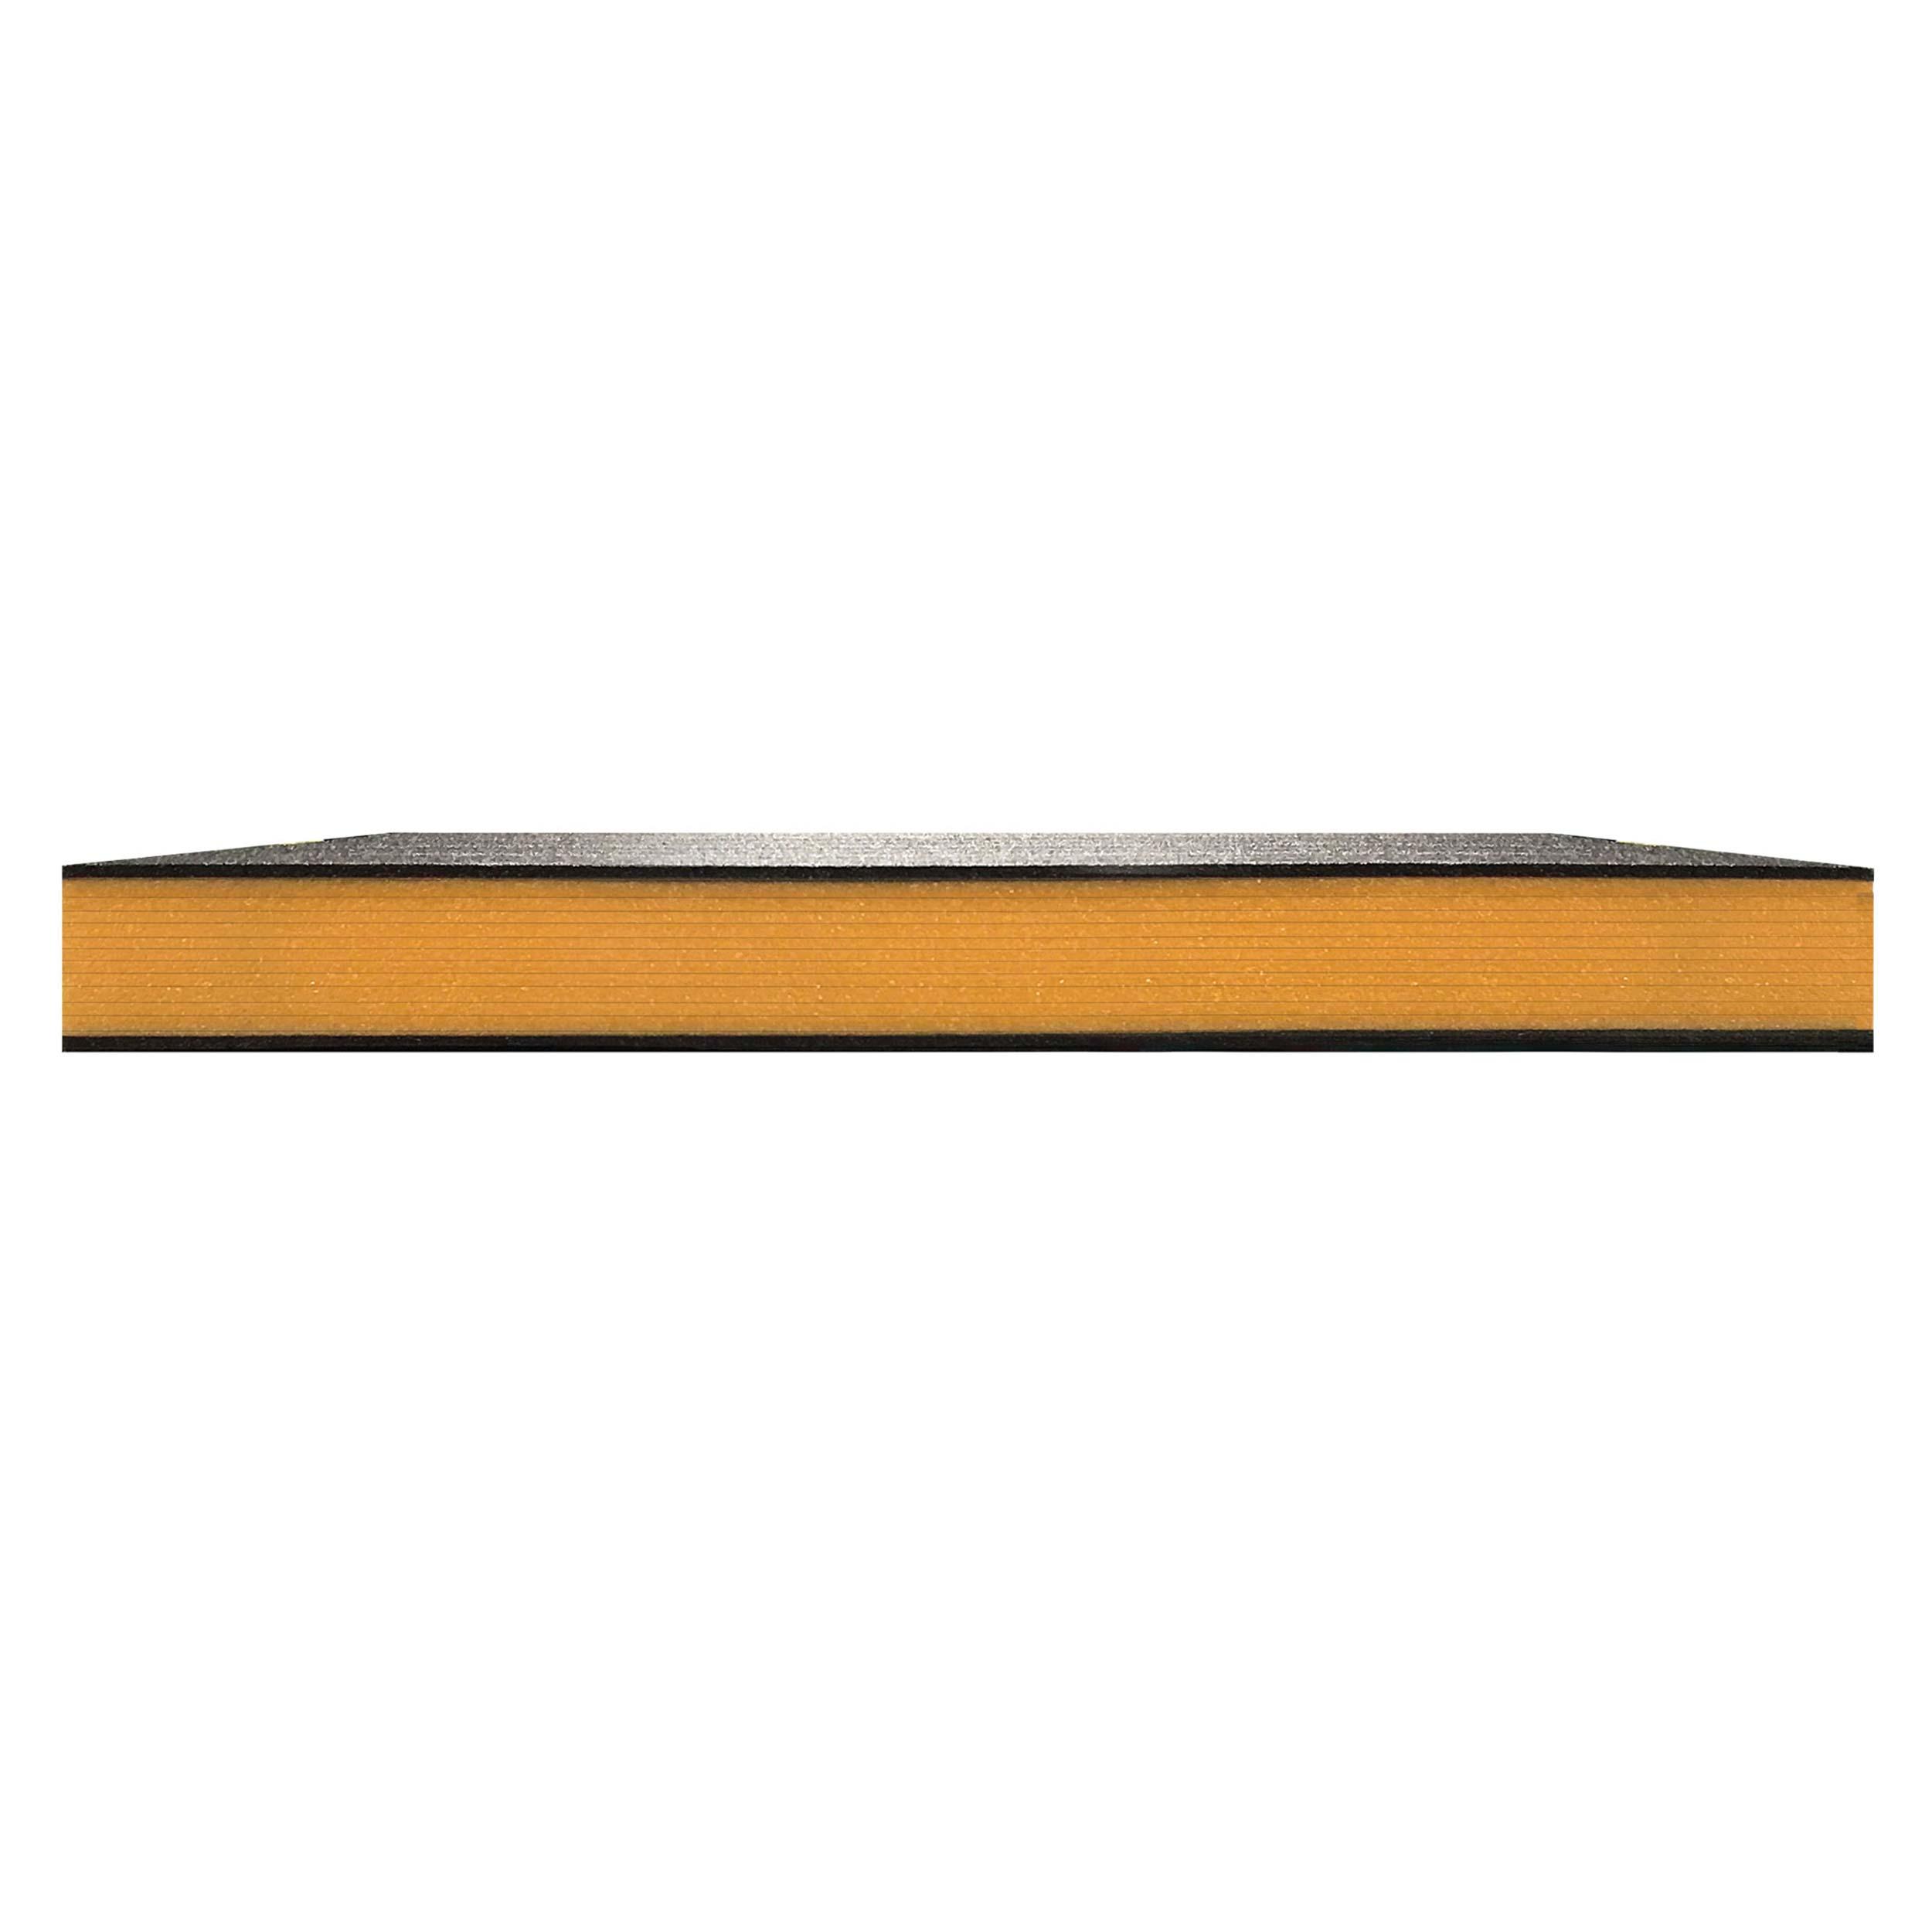 Kaizen Foam Yellow/Black 57mm